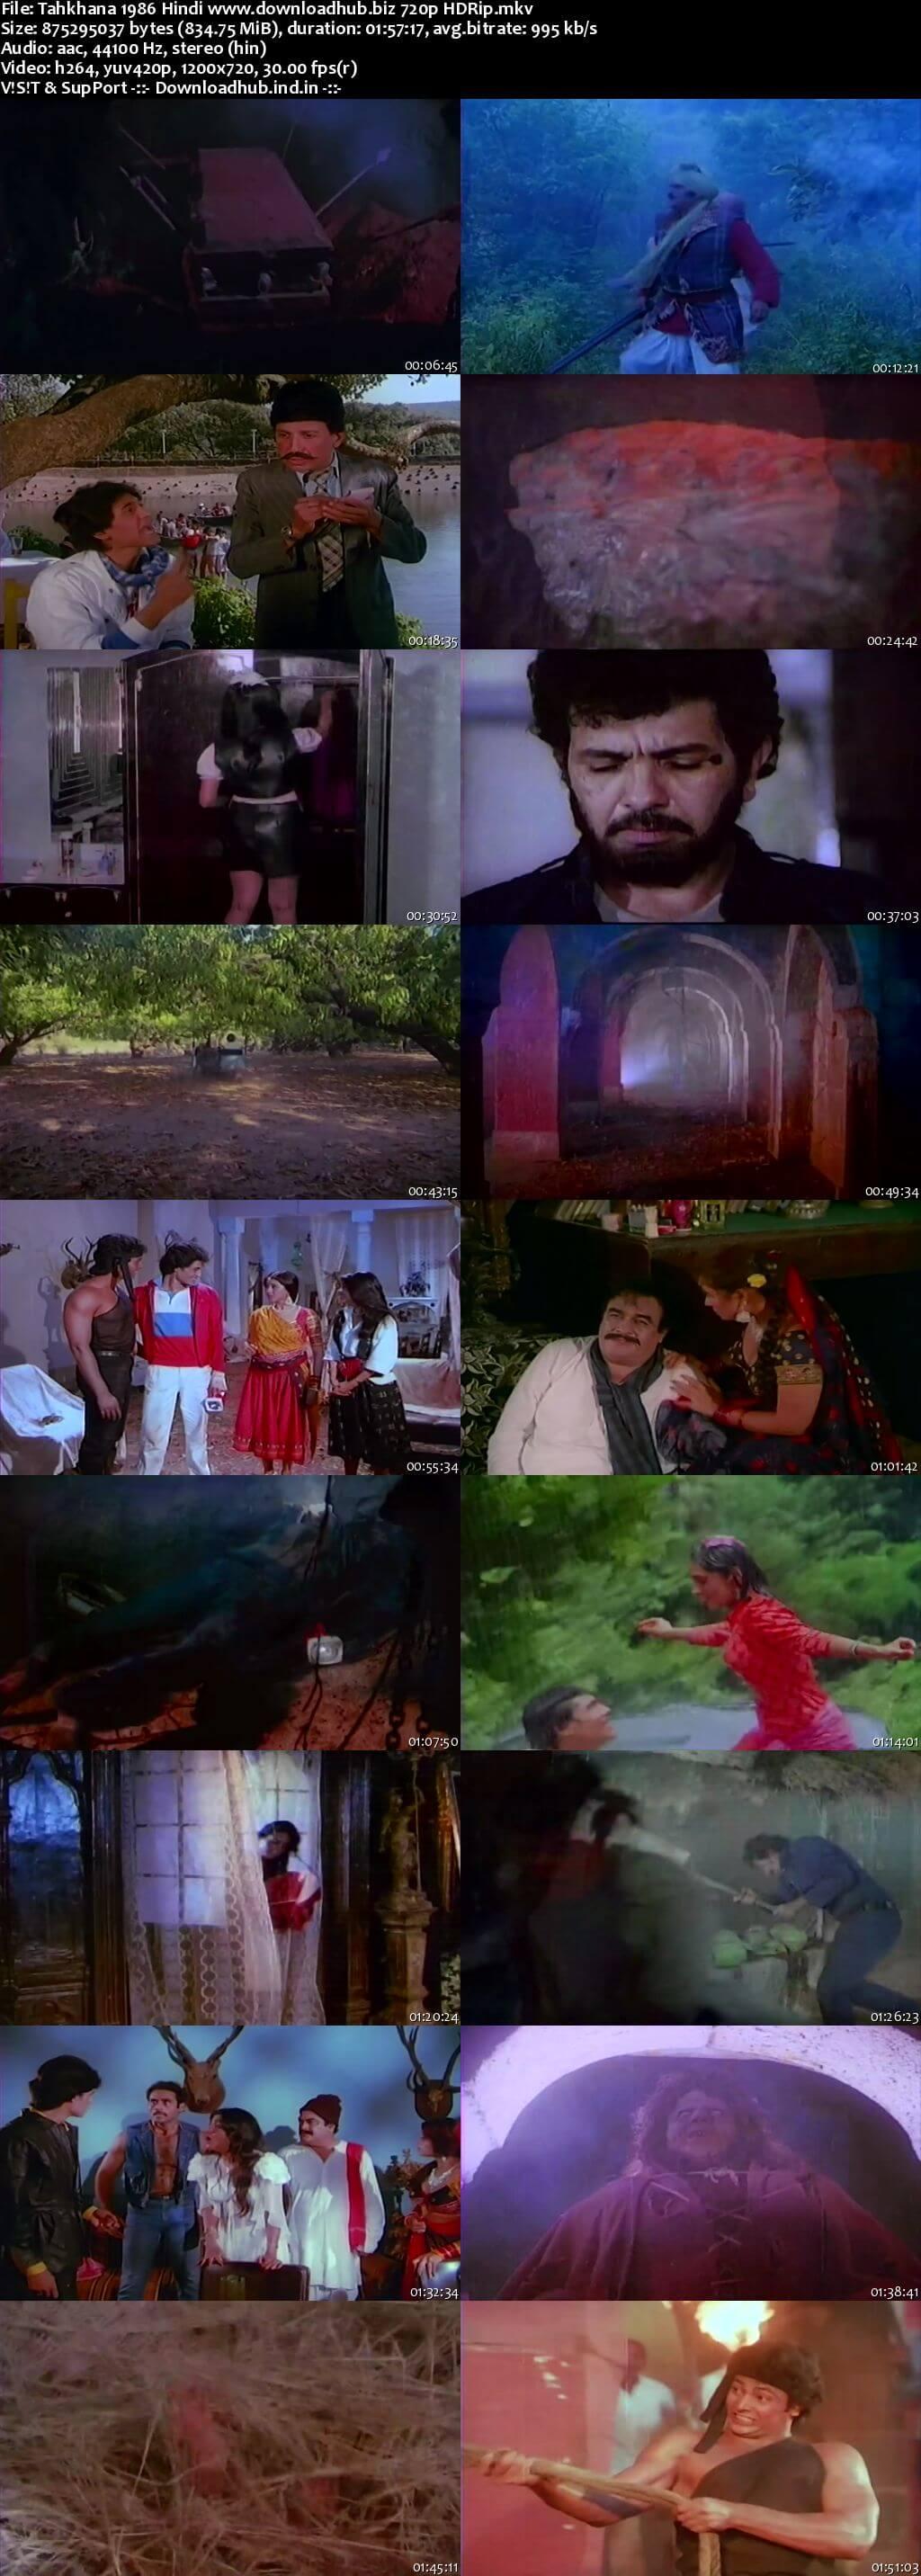 Tahkhana 1986 Hindi 720p HDRip x264